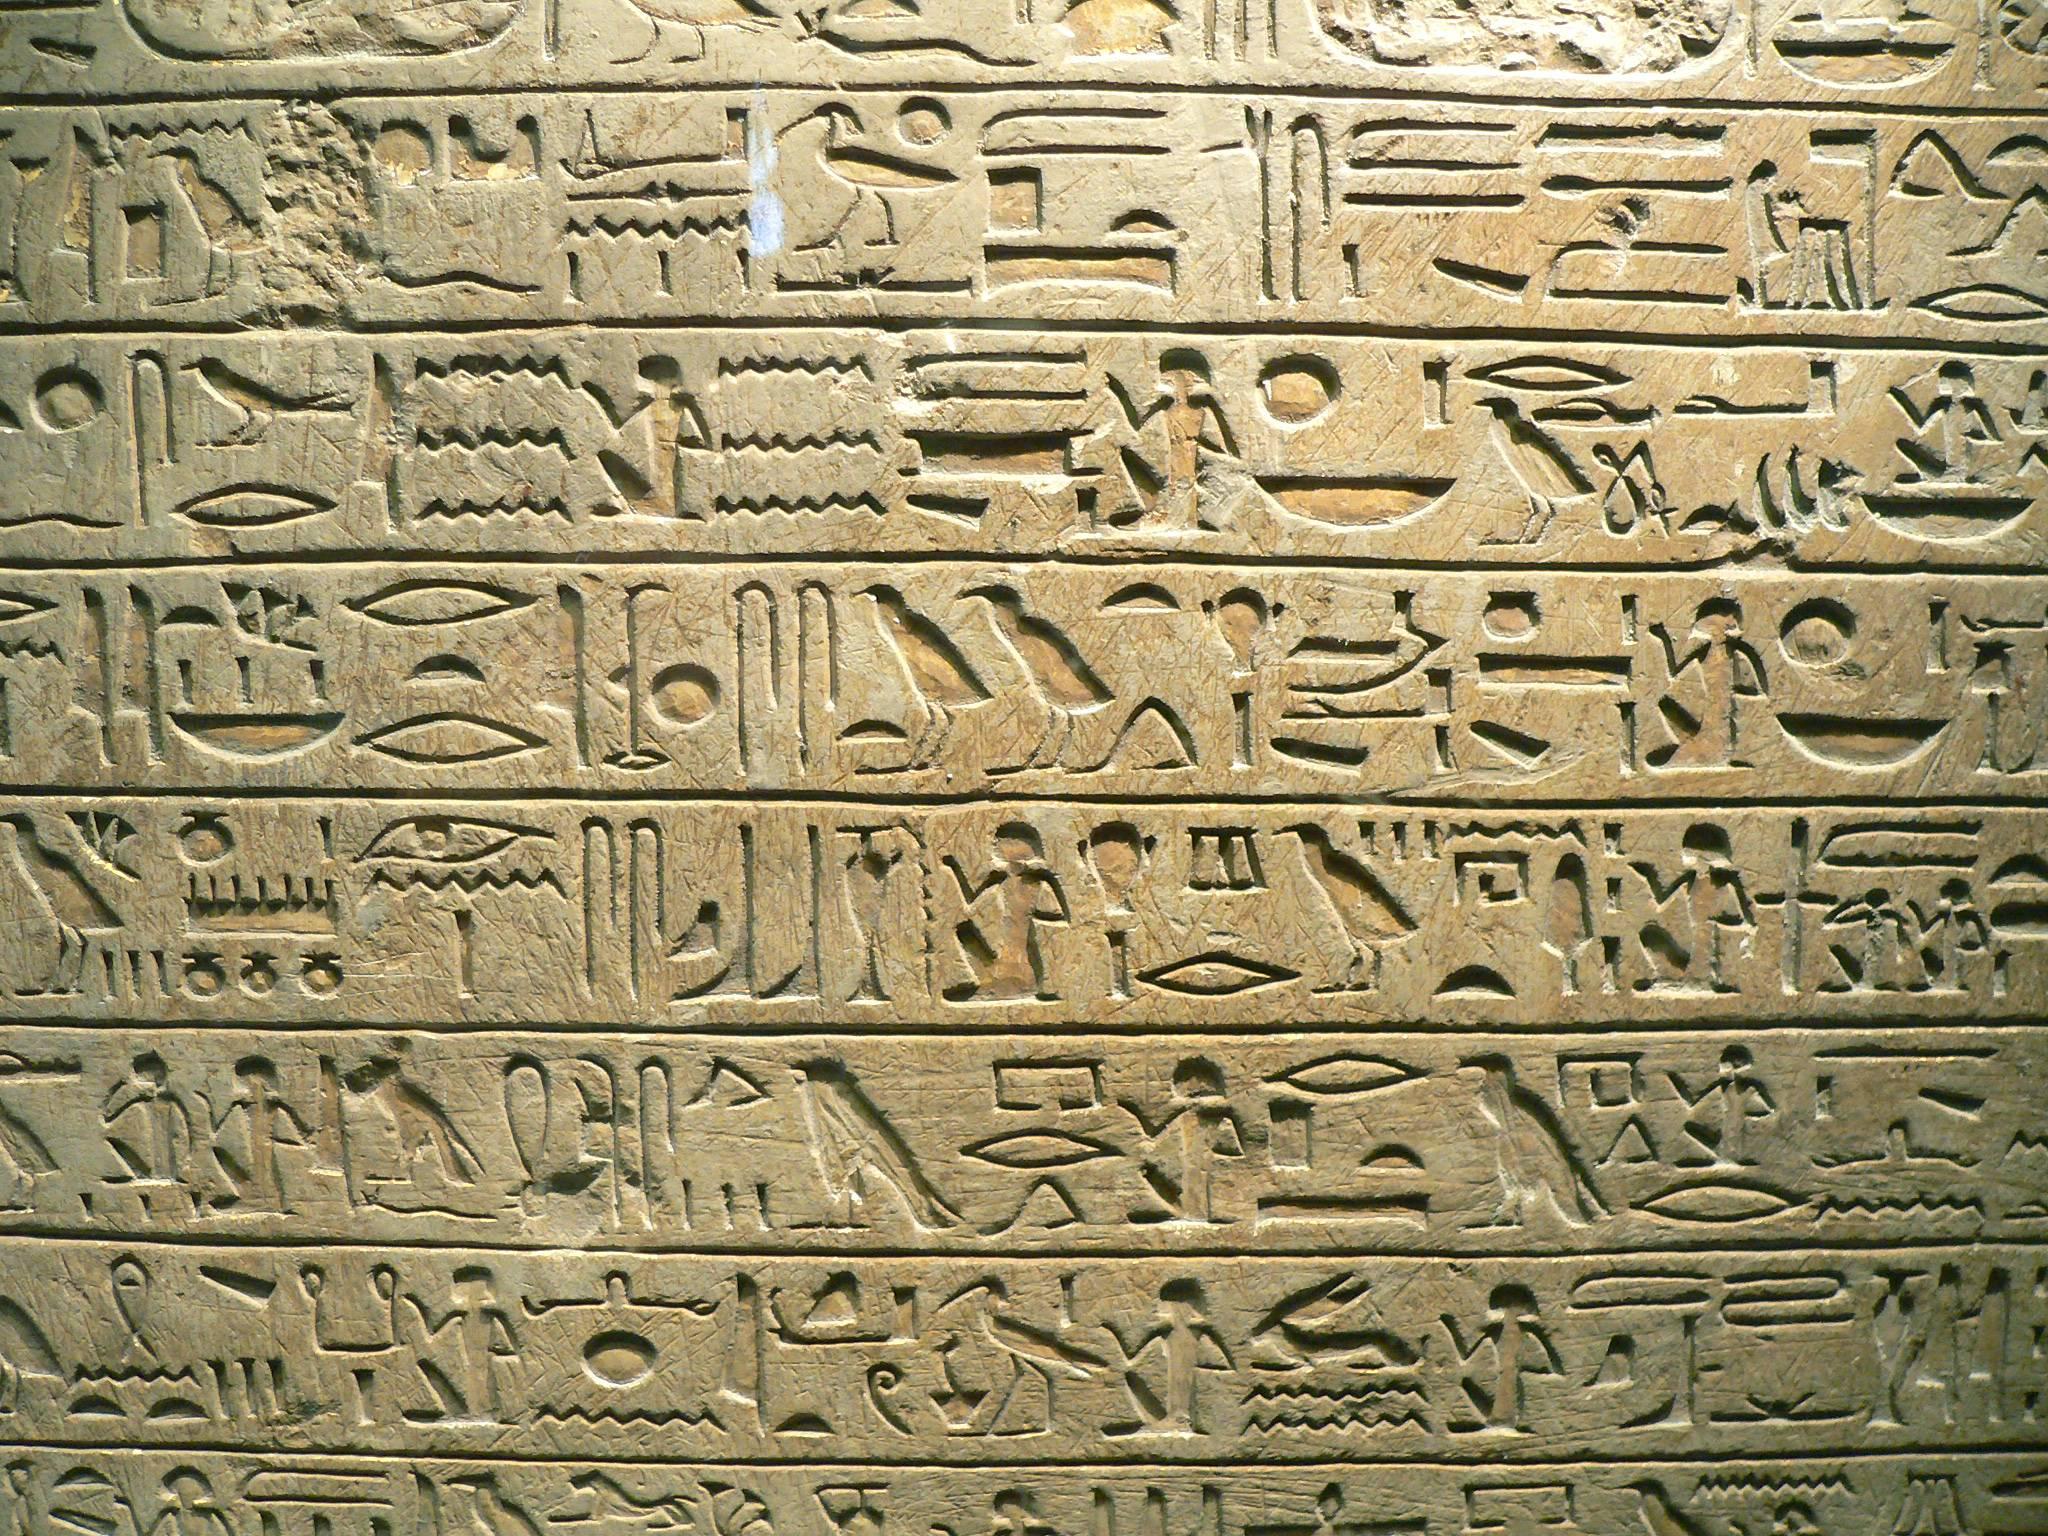 Egyptian Hieroglyphics Wallpapers Wallpaper Cave